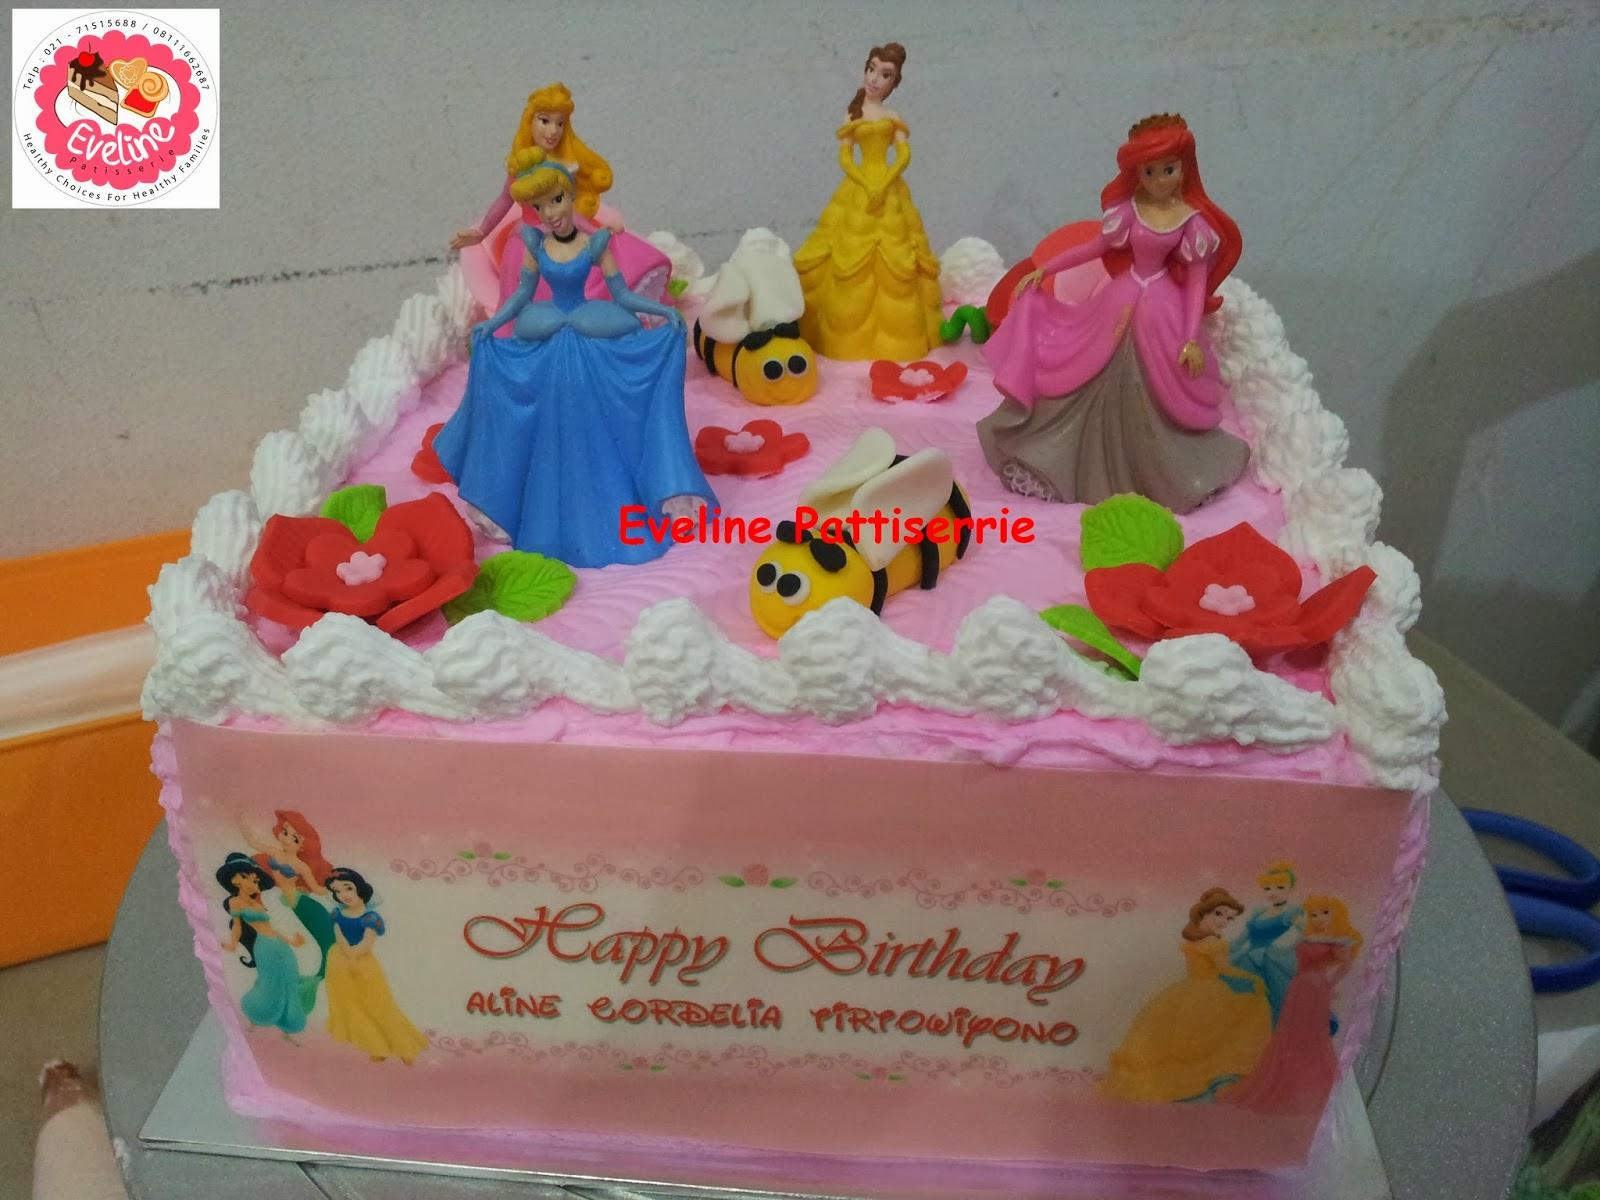 untuk membuat kue ultah anak ini kue ultah anak pertama yang aku buat ...